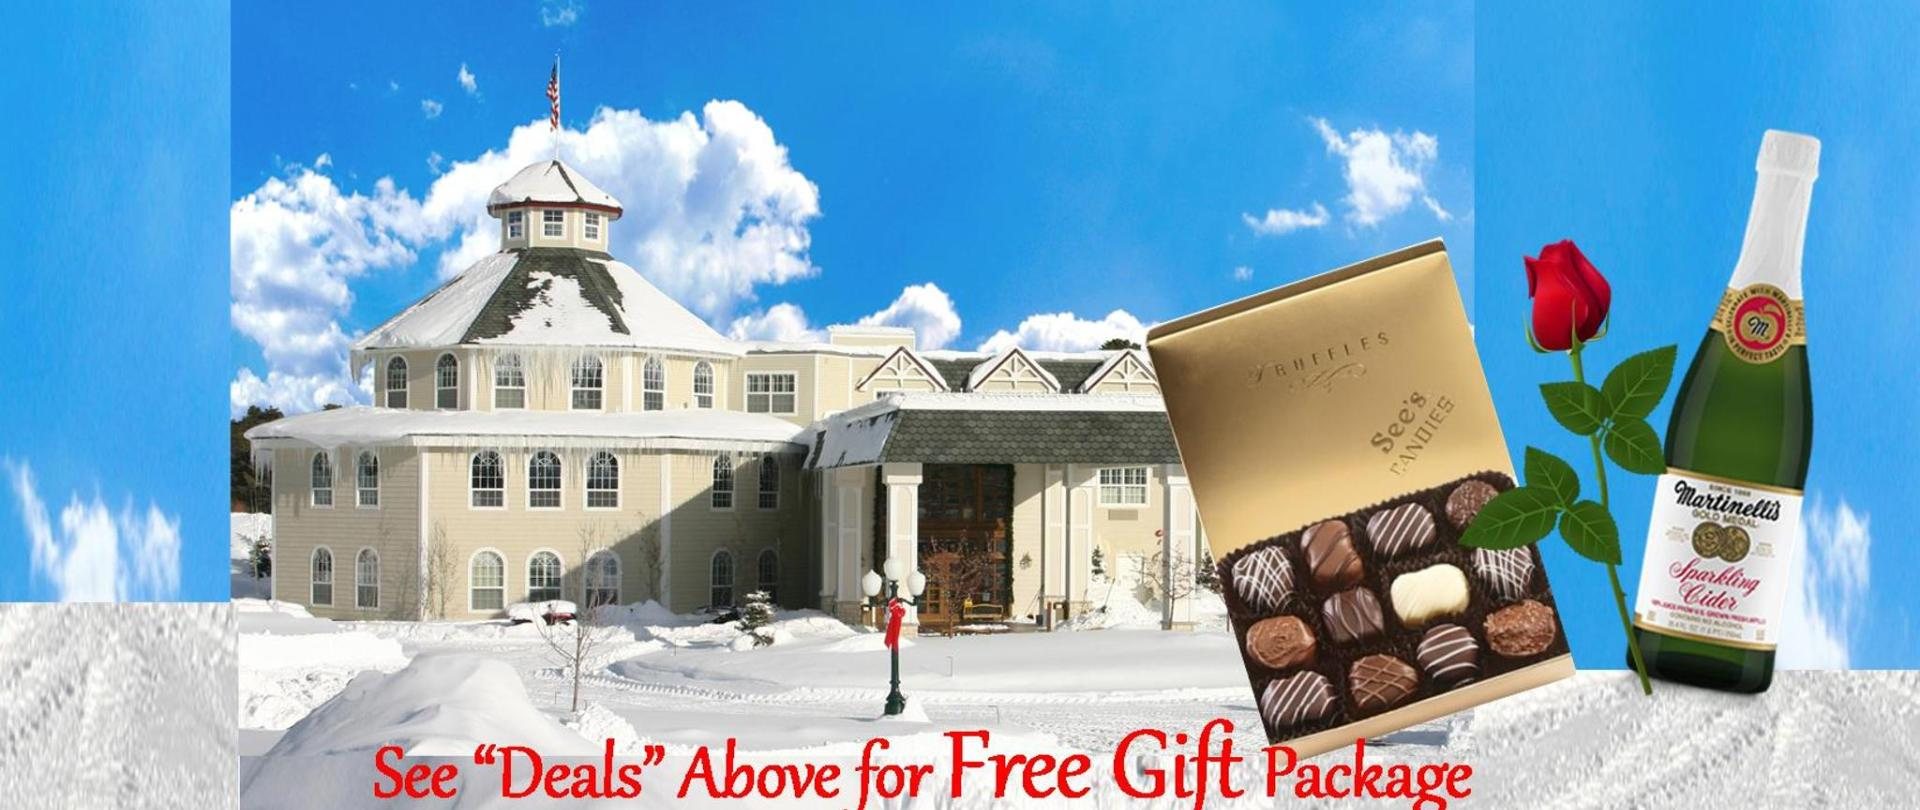 val-free-gift-2.jpg